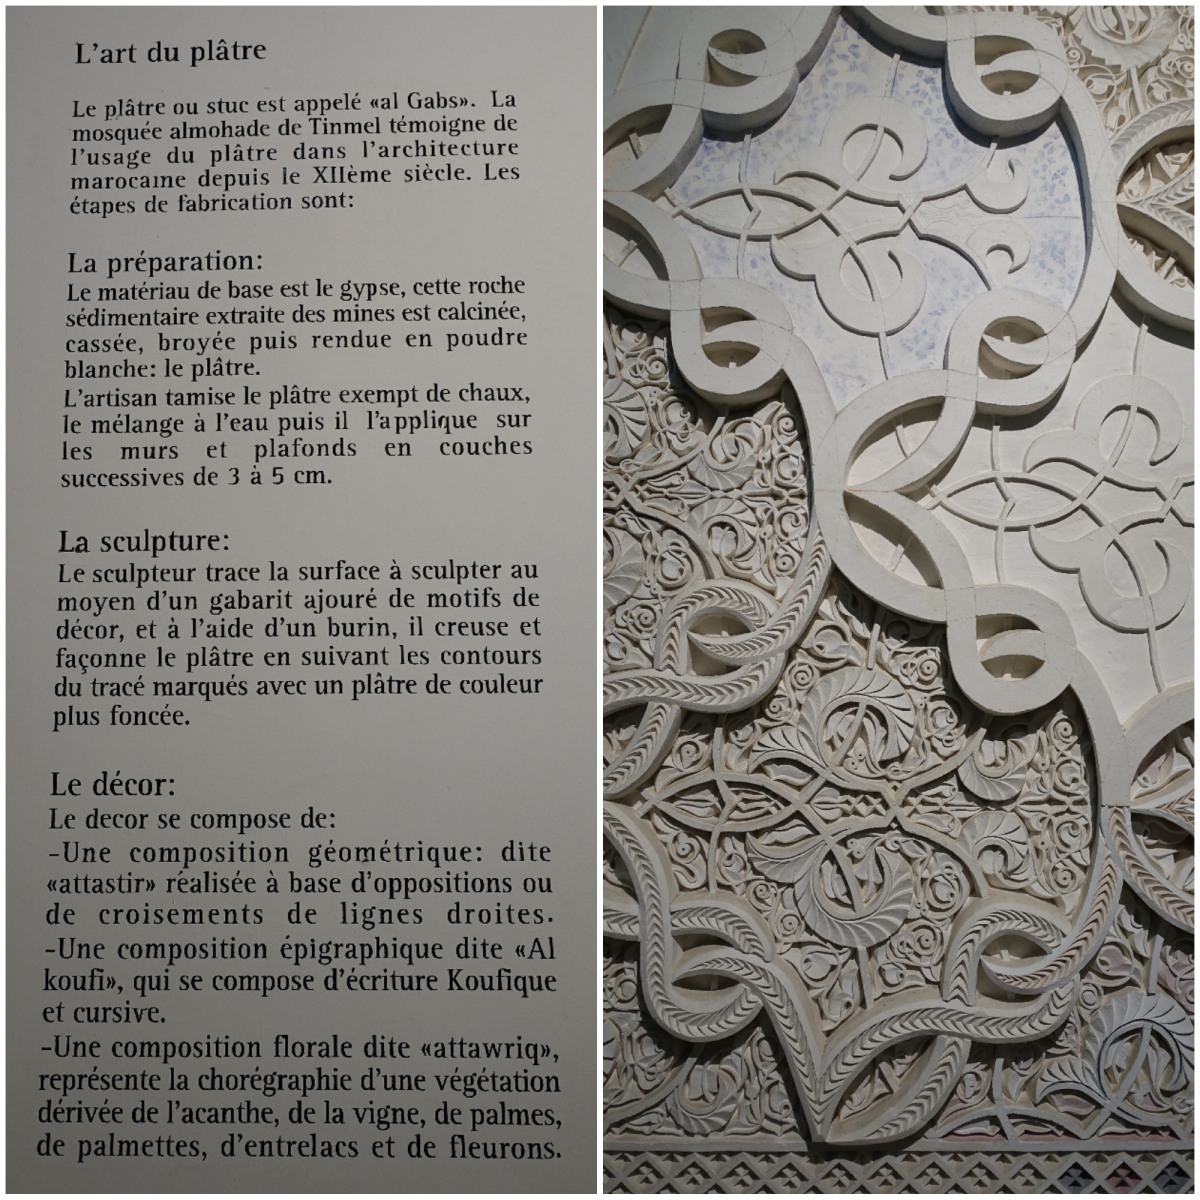 Stunning Panneau Ajoure Marocain Ideas - House Design - marcomilone.com